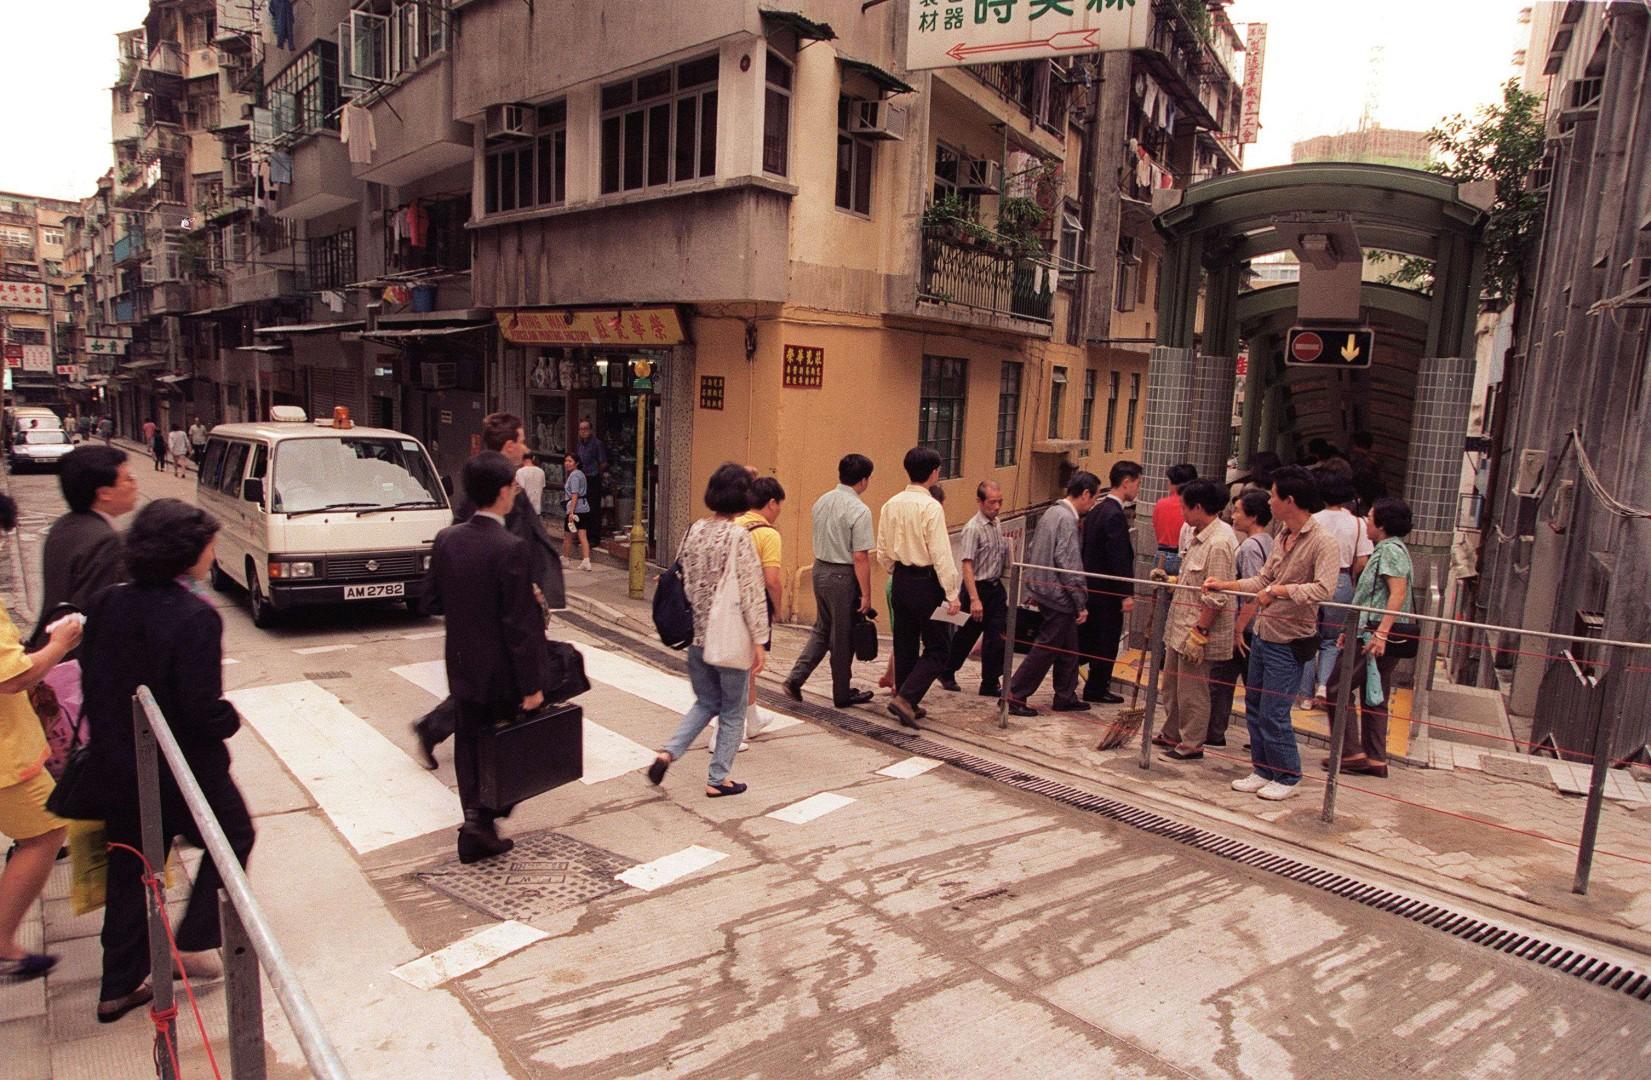 brand new c70c7 0c740 Stories behind Hong Kong districts  SoHo before the escalator   South China  Morning Post